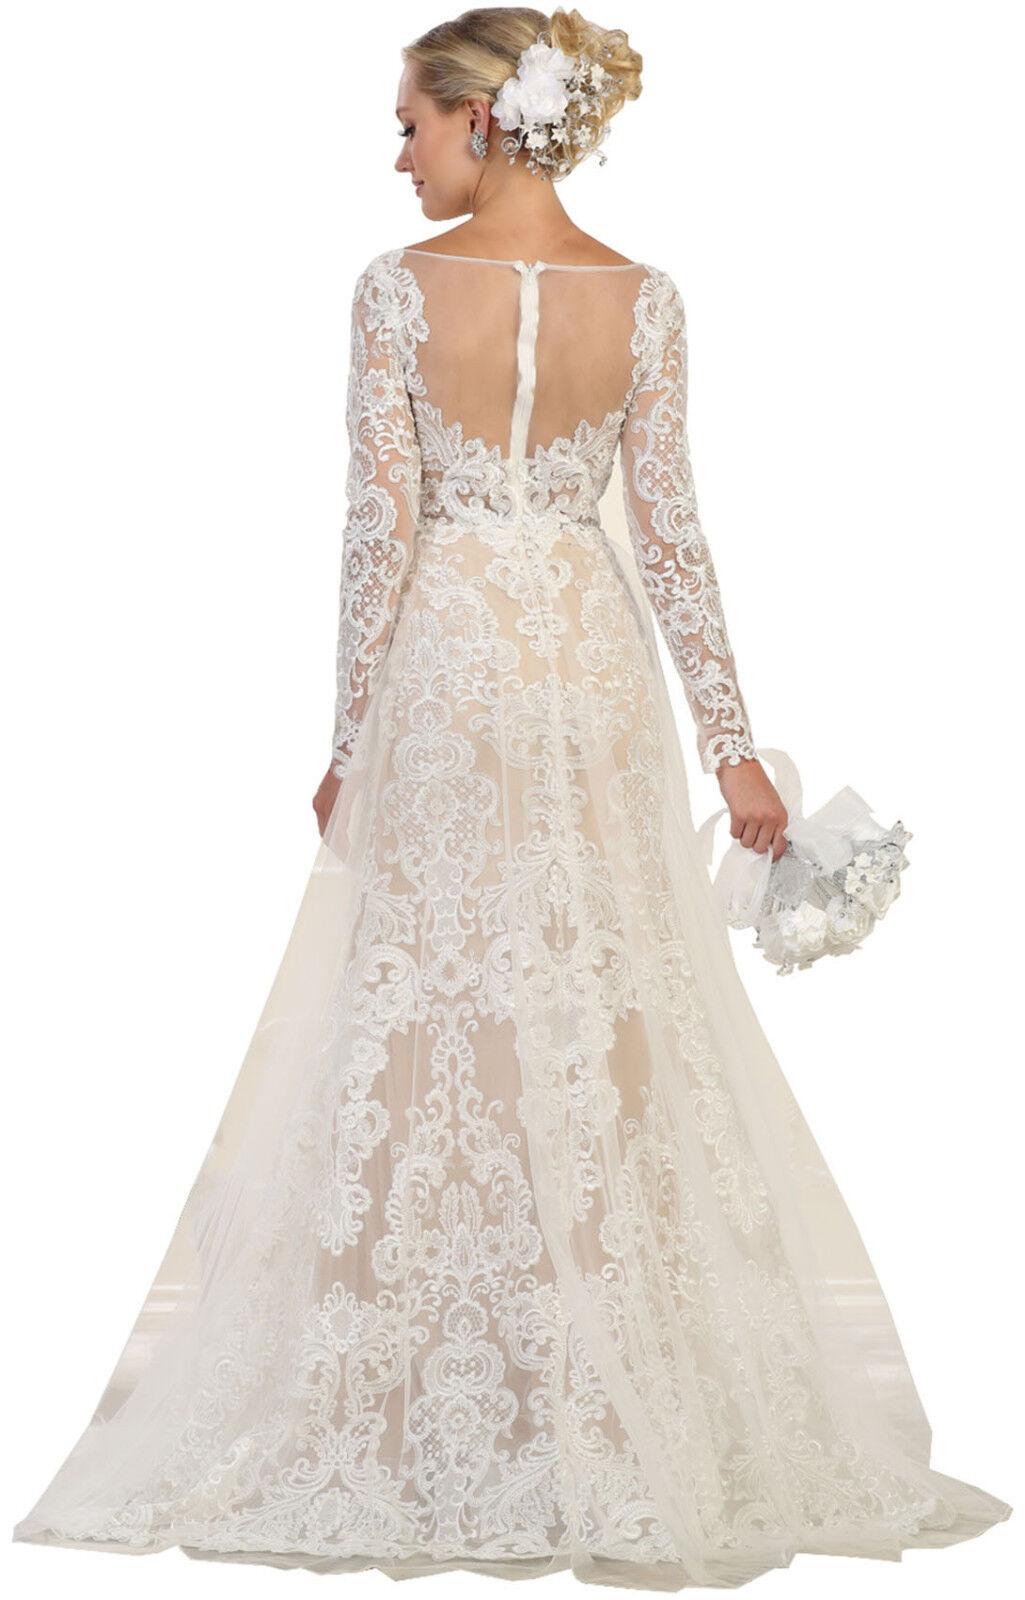 NEW DESIGNER DESTINATION WEDDING DRESSES CHURCH FORMAL BRIDAL EVENING GOWN GALA